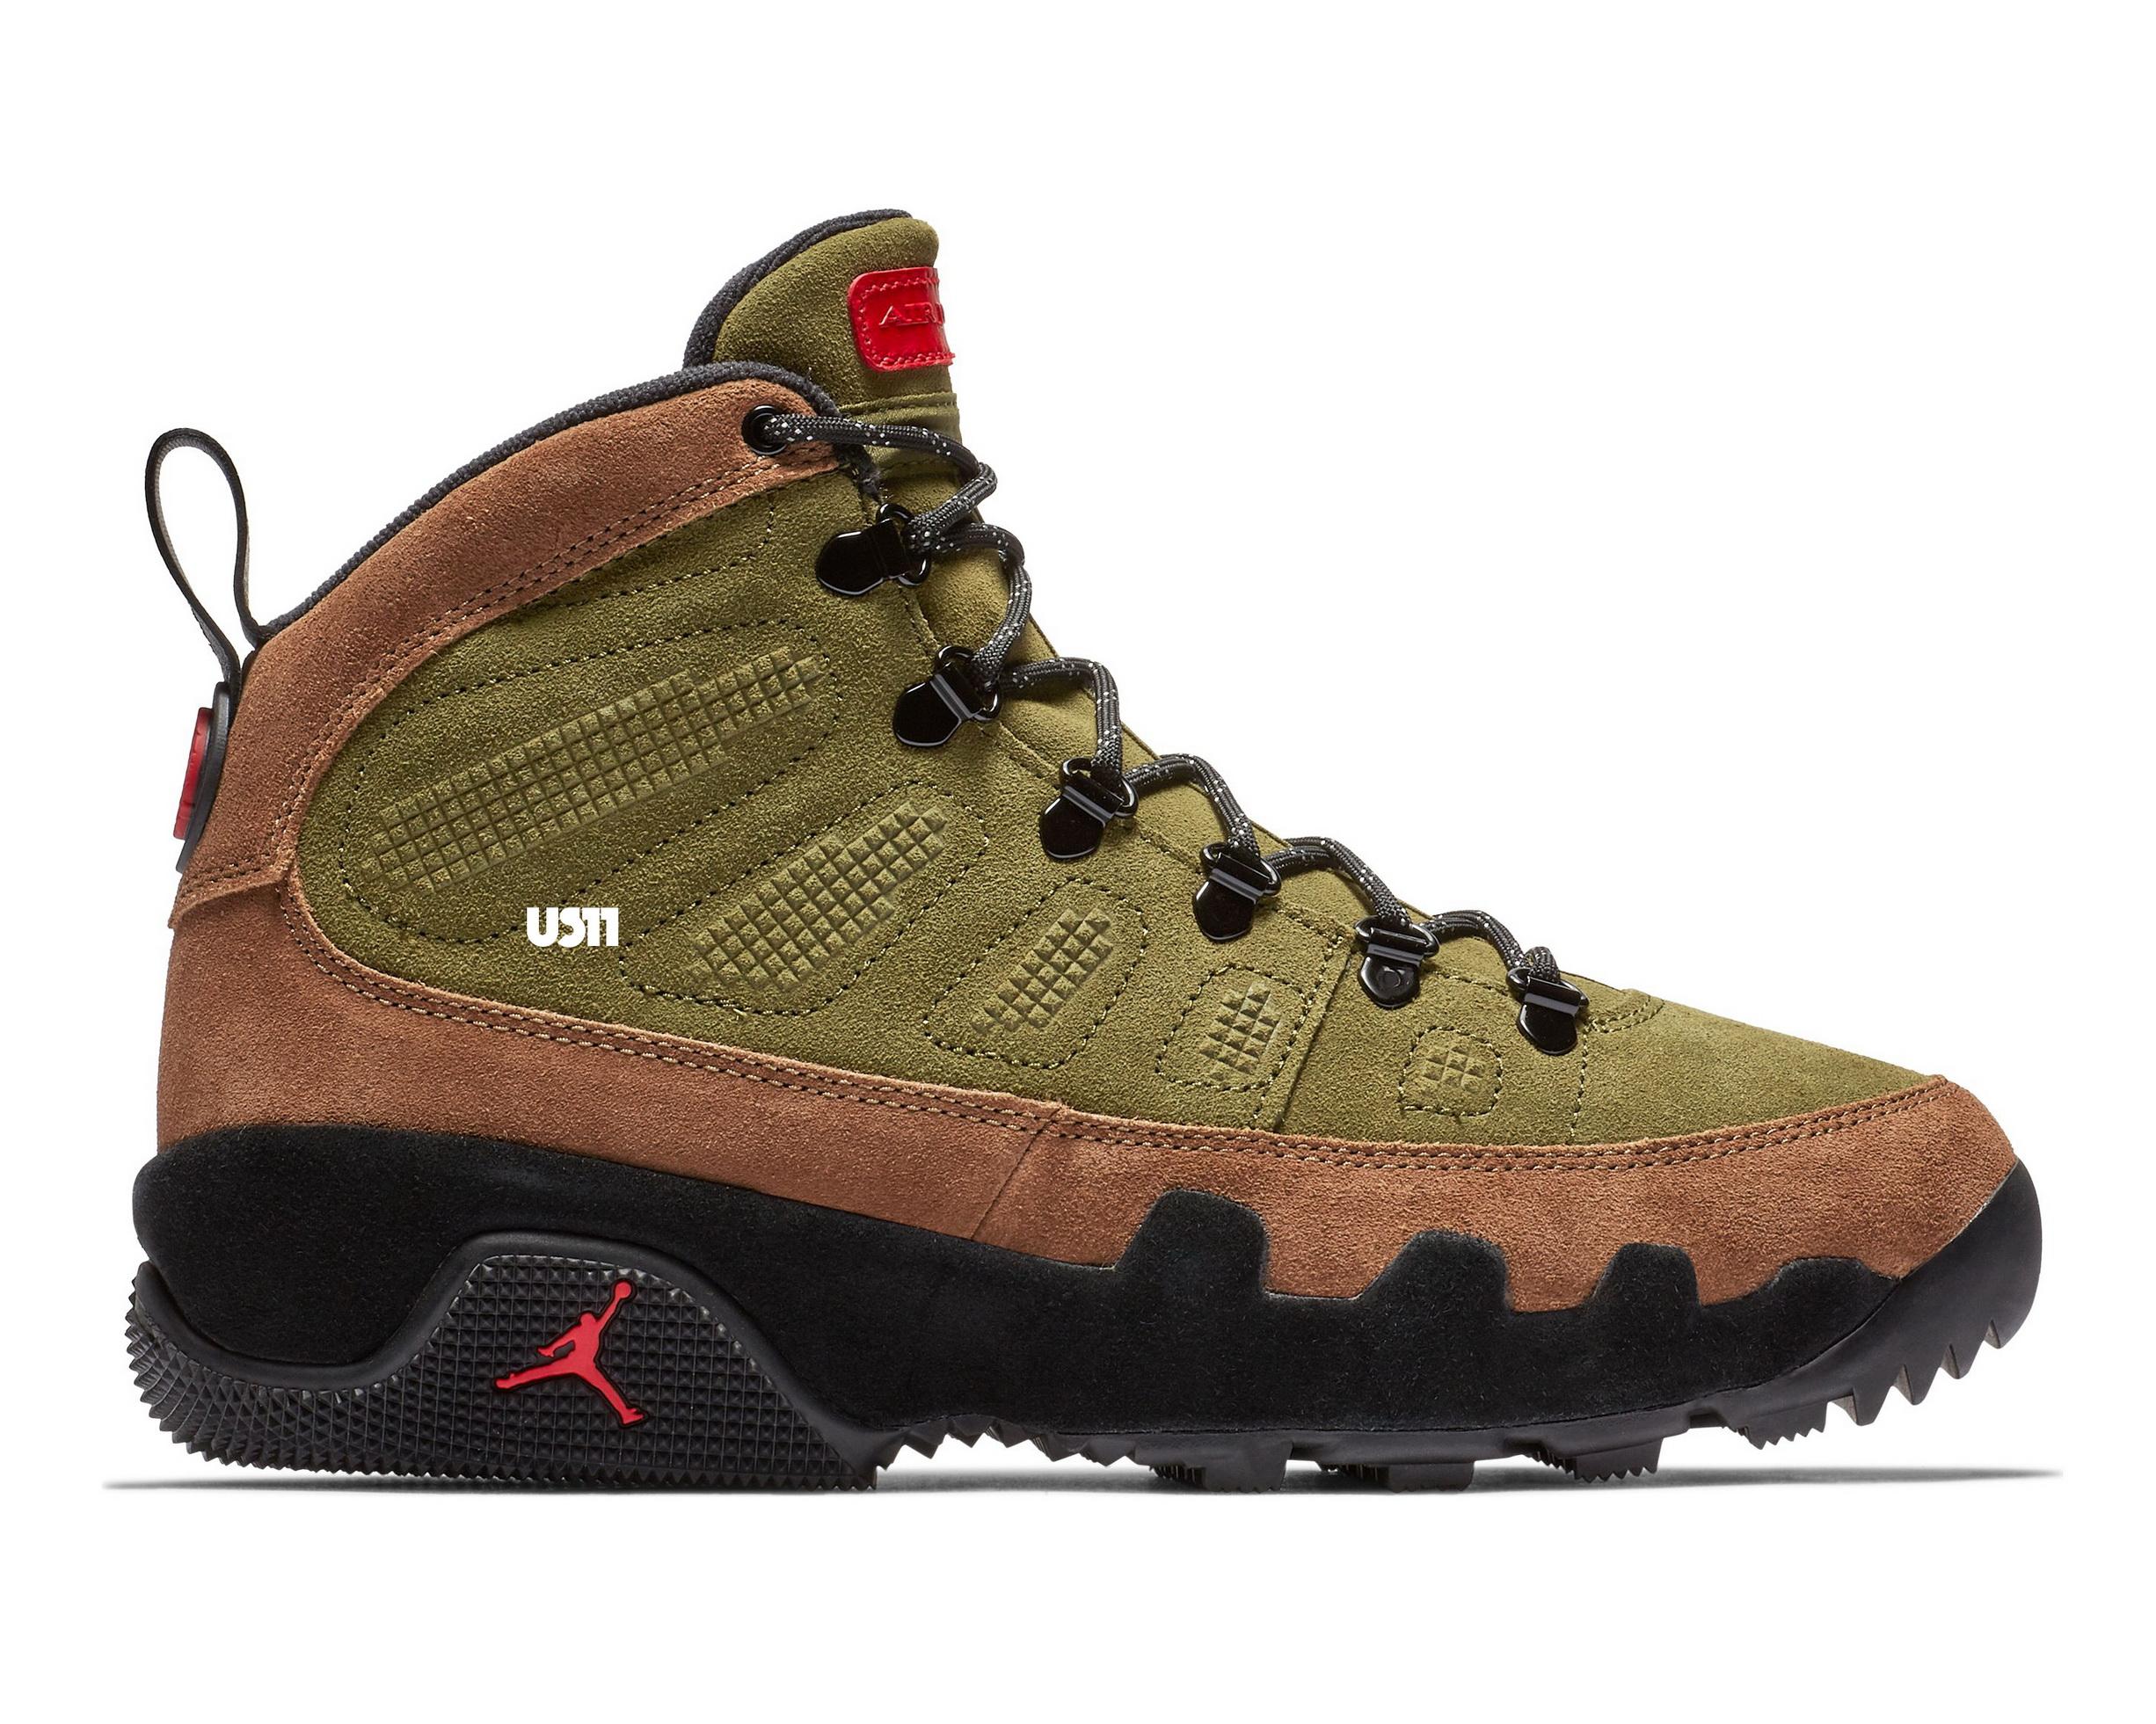 Air jordan 9 boot NRG olive release date